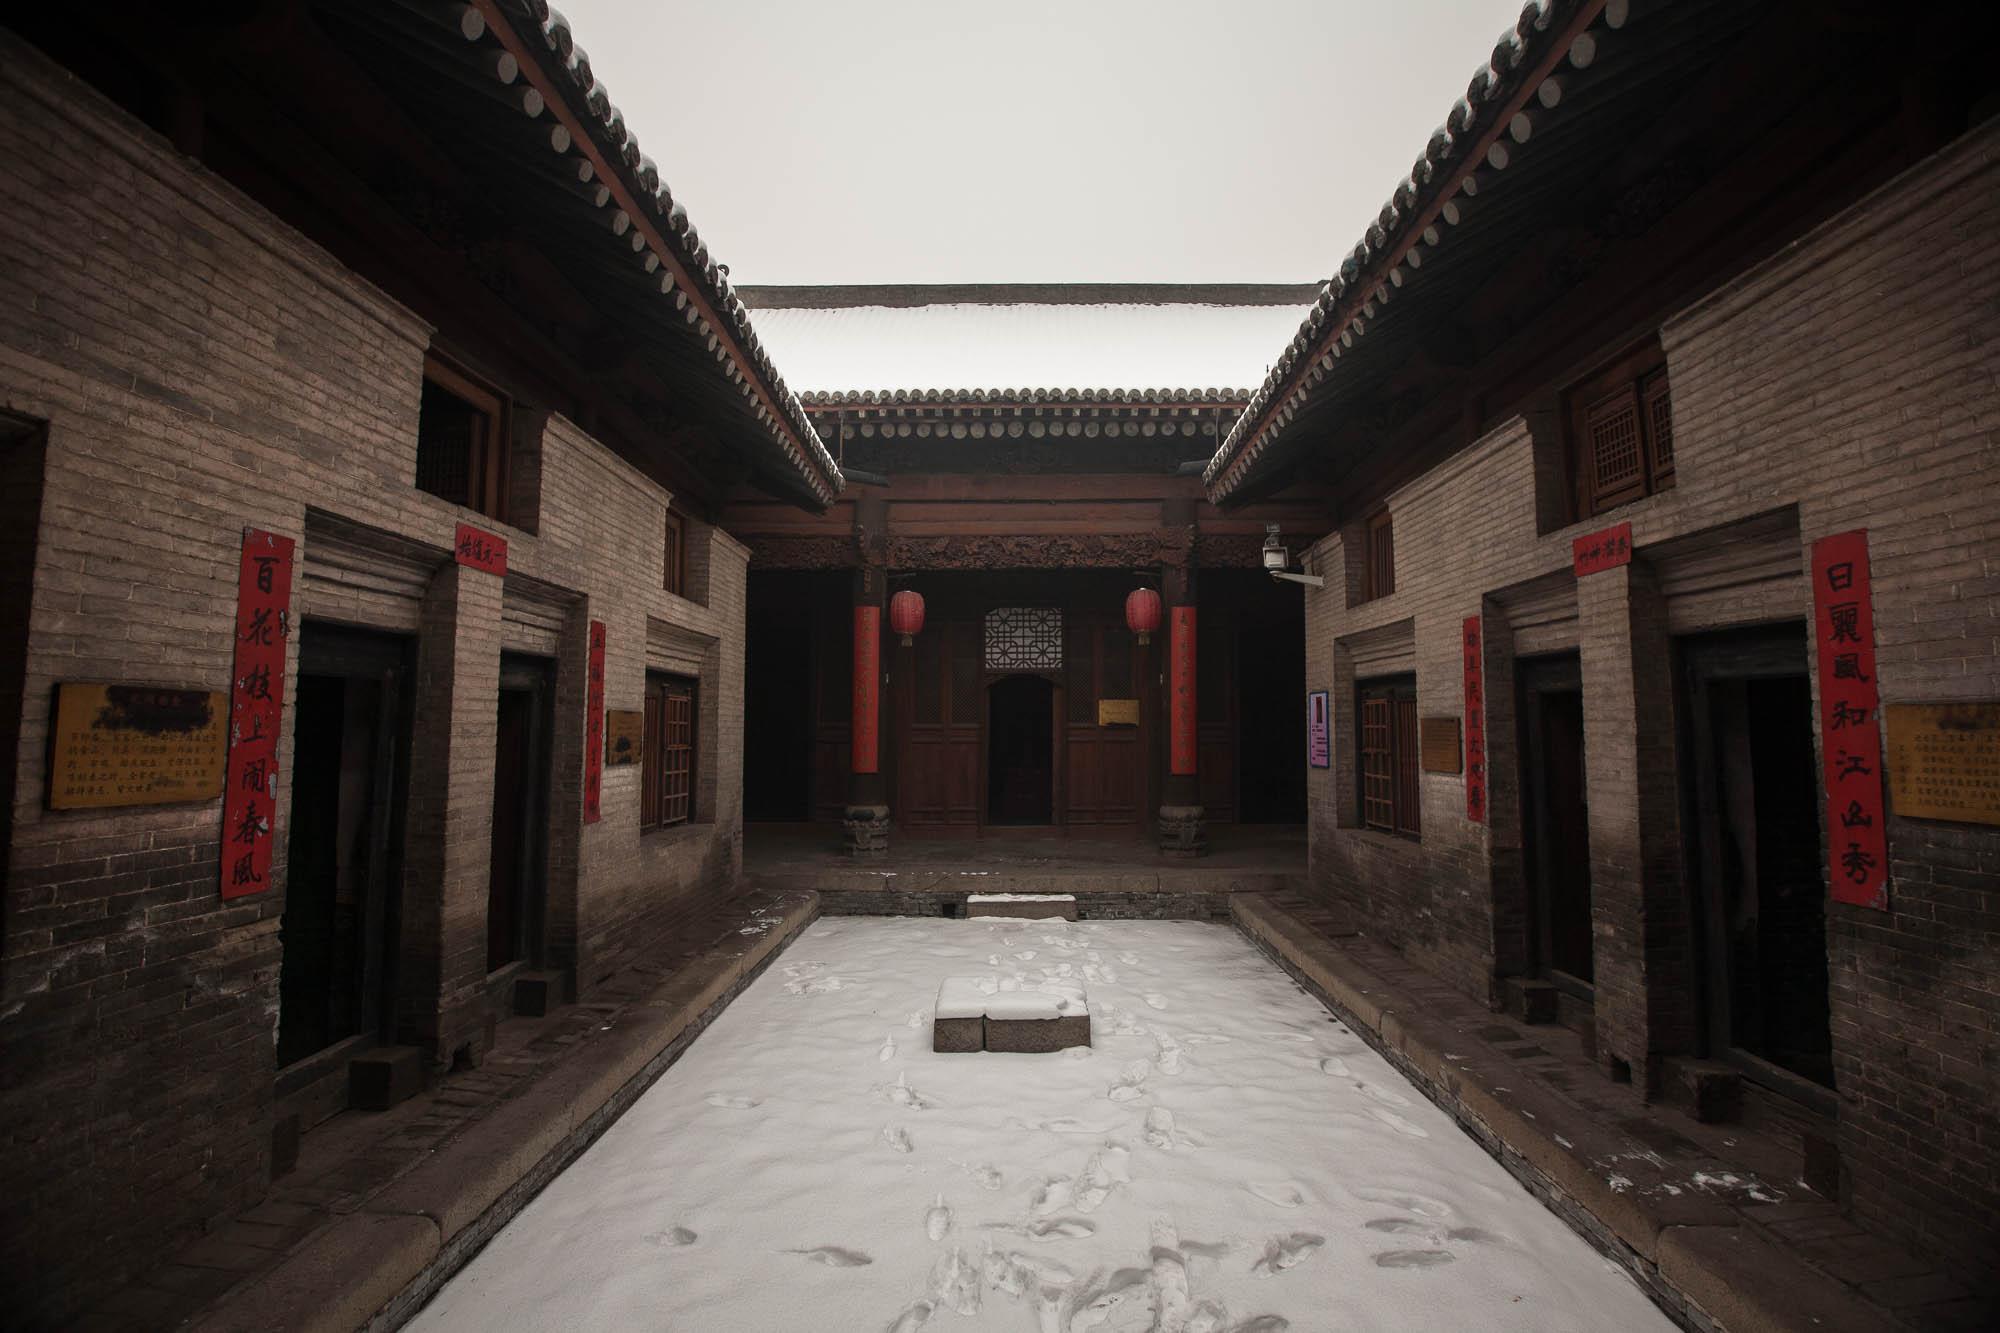 Dingcun courtyard